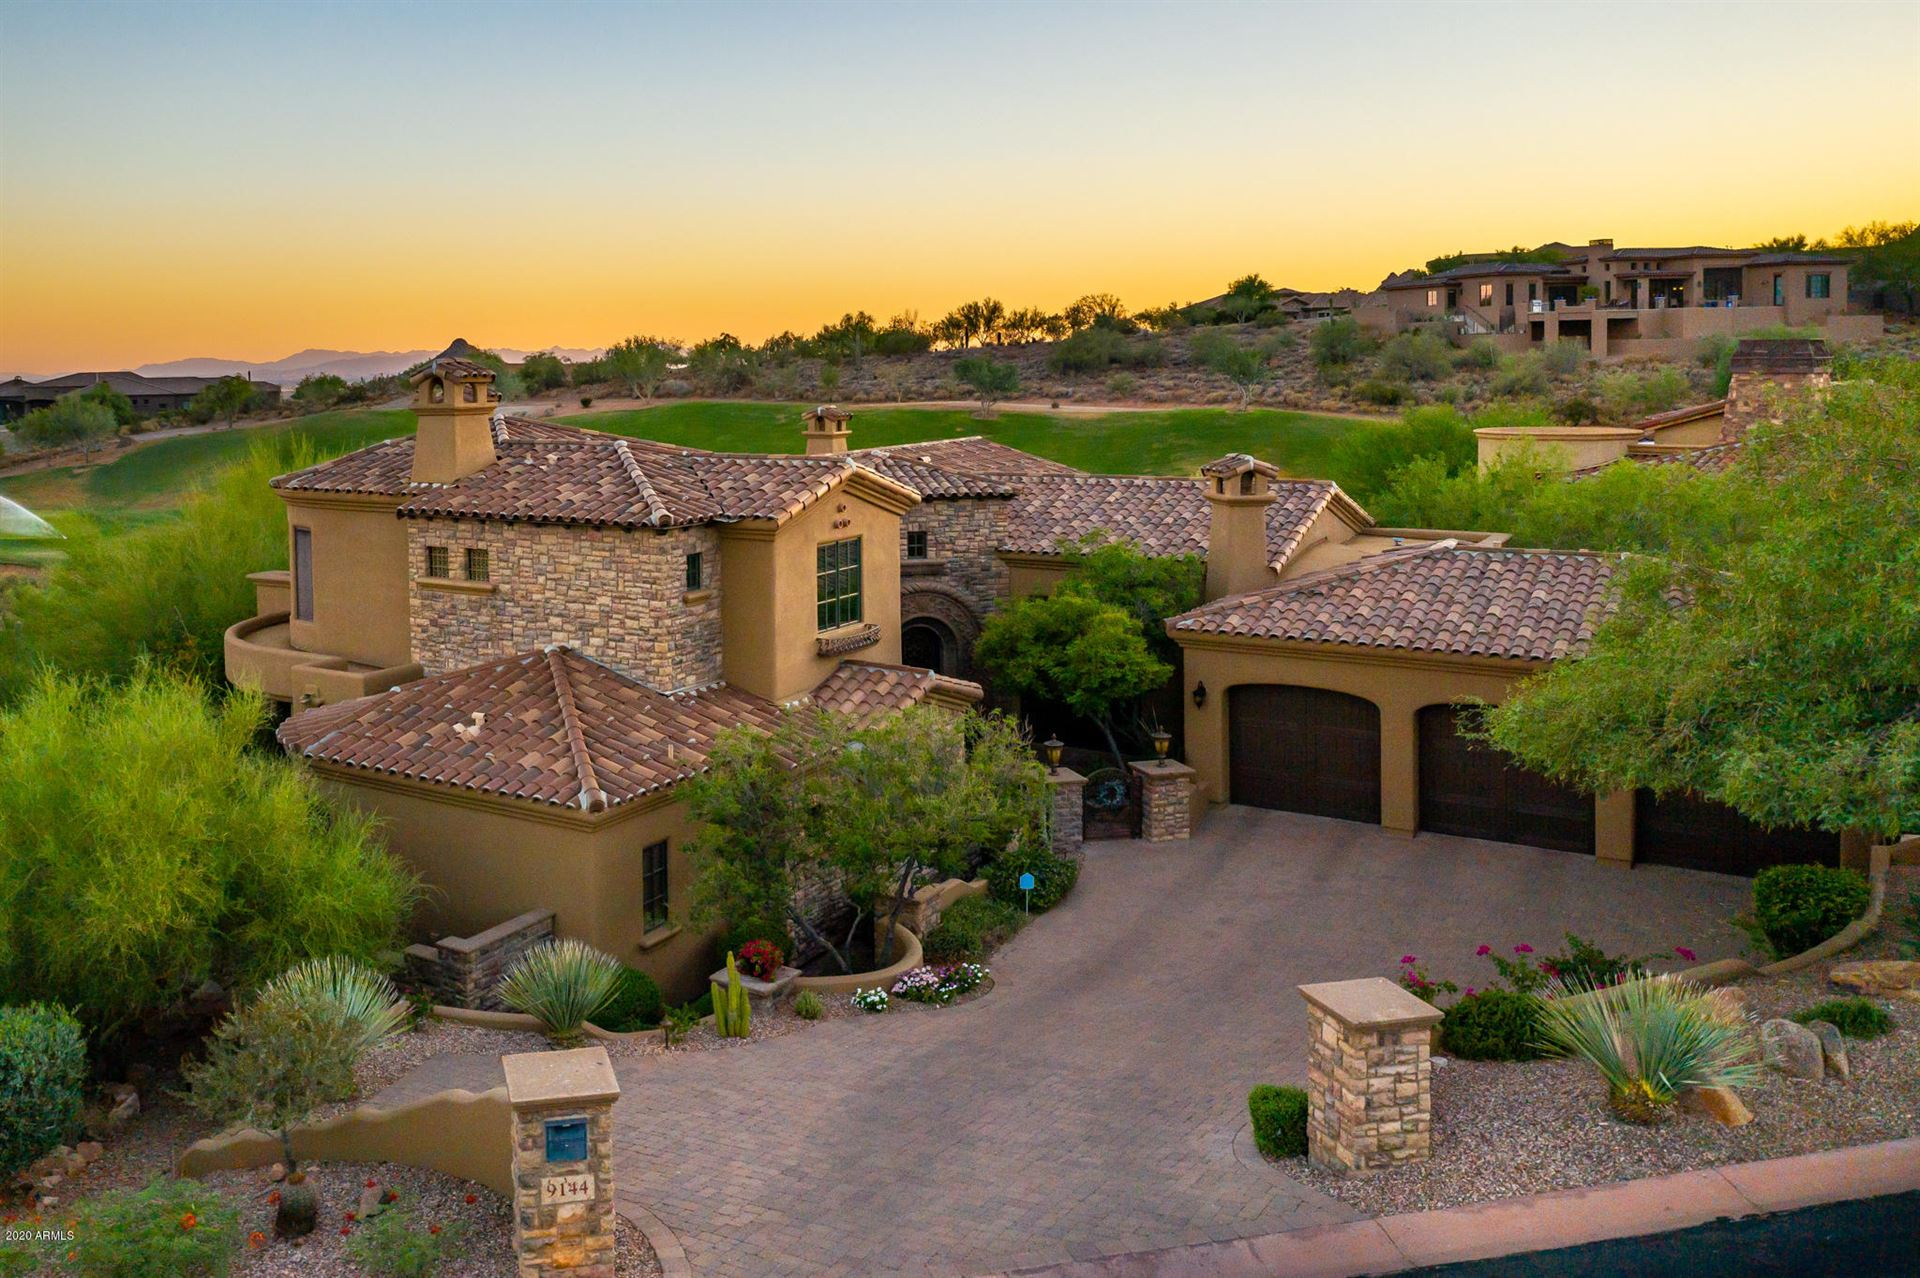 9144 N Fireridge Trail, Fountain Hills, AZ 85268 - MLS#: 6092042